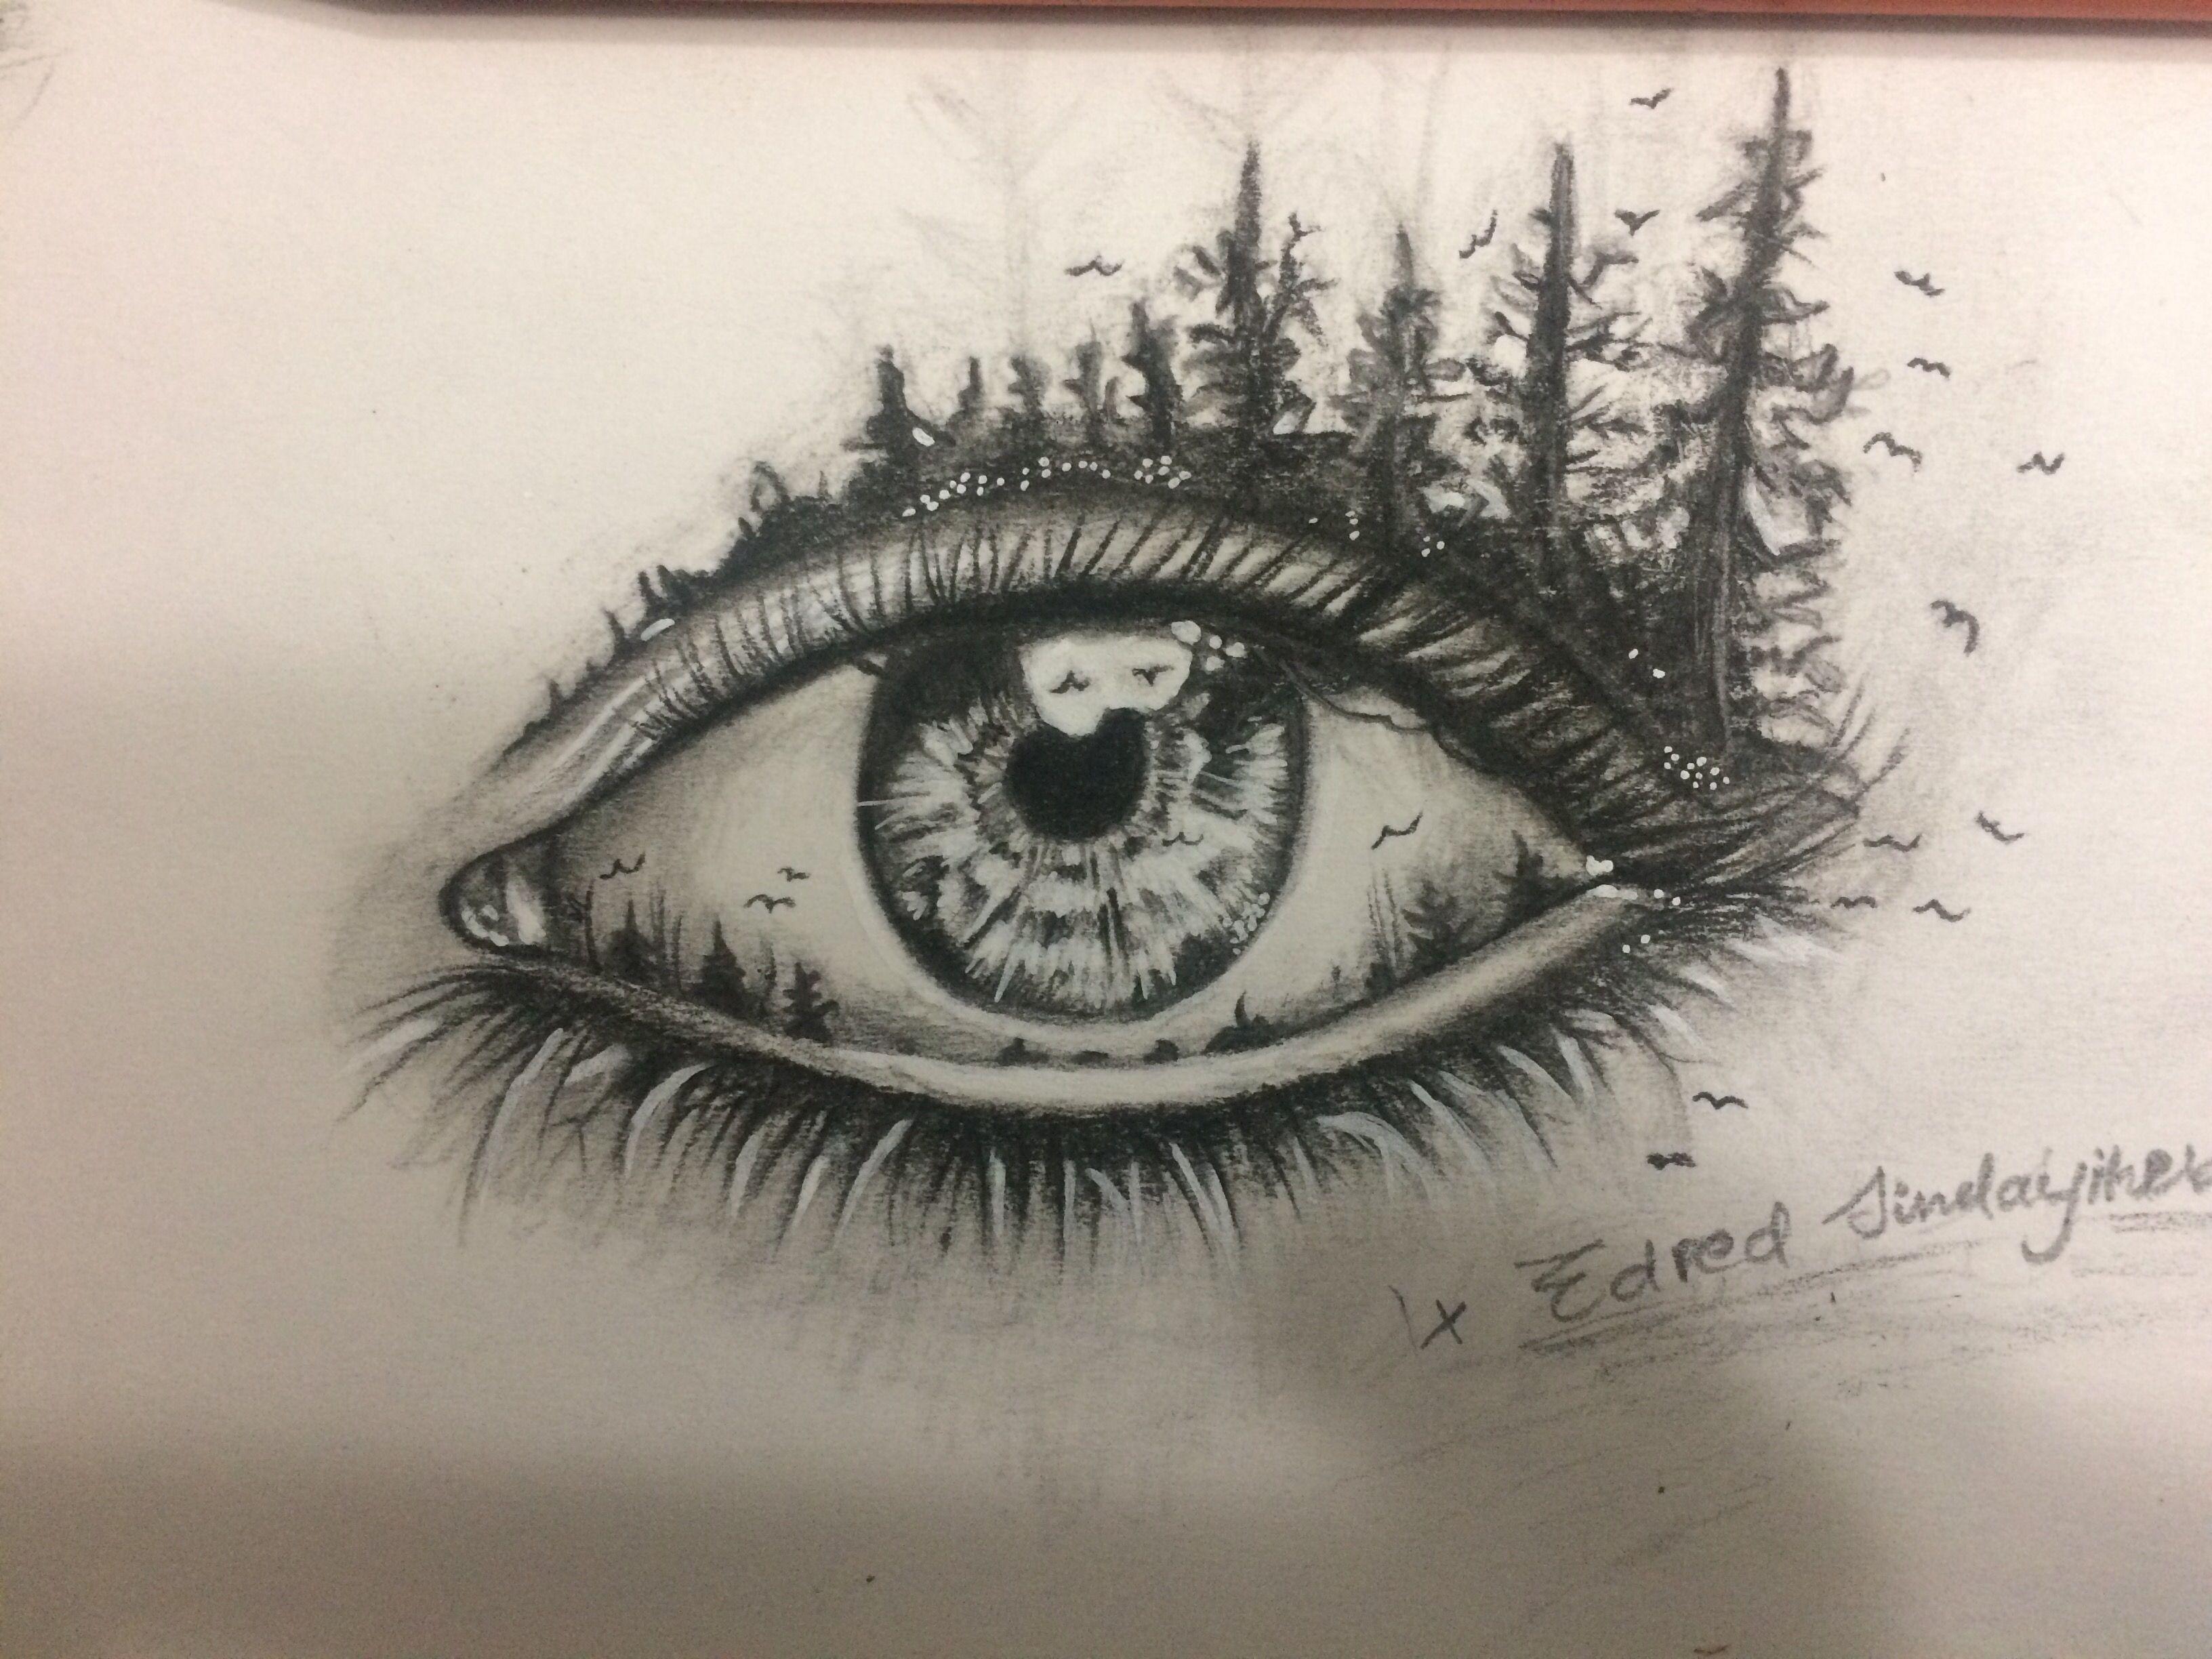 A Beautiful Creative Eye Drawing Not An Original From Me But